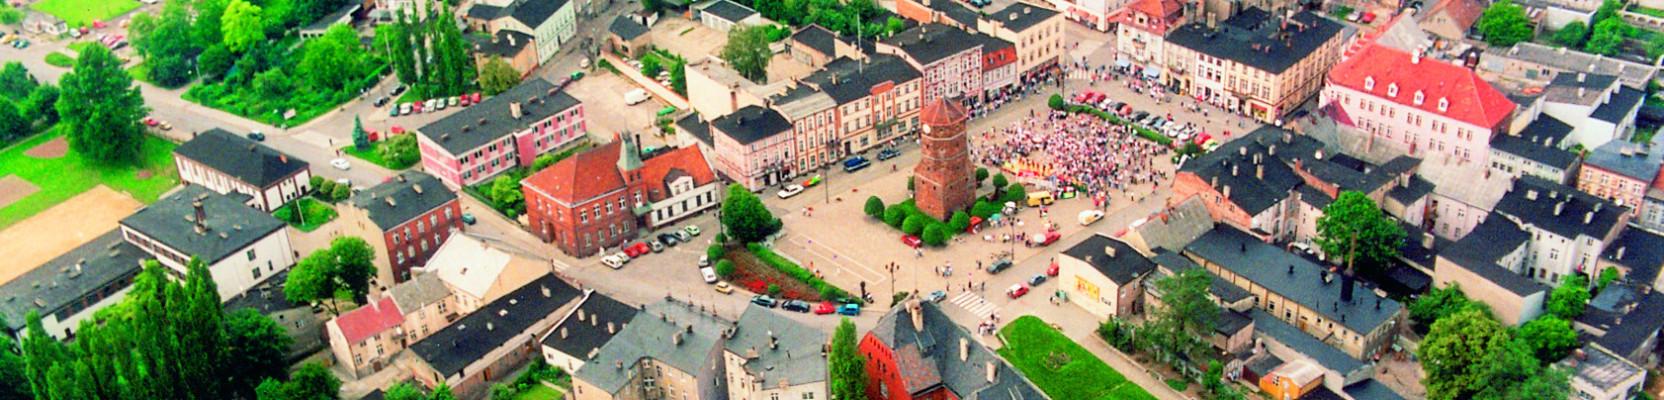 Blog Leszka o mieście Żnin